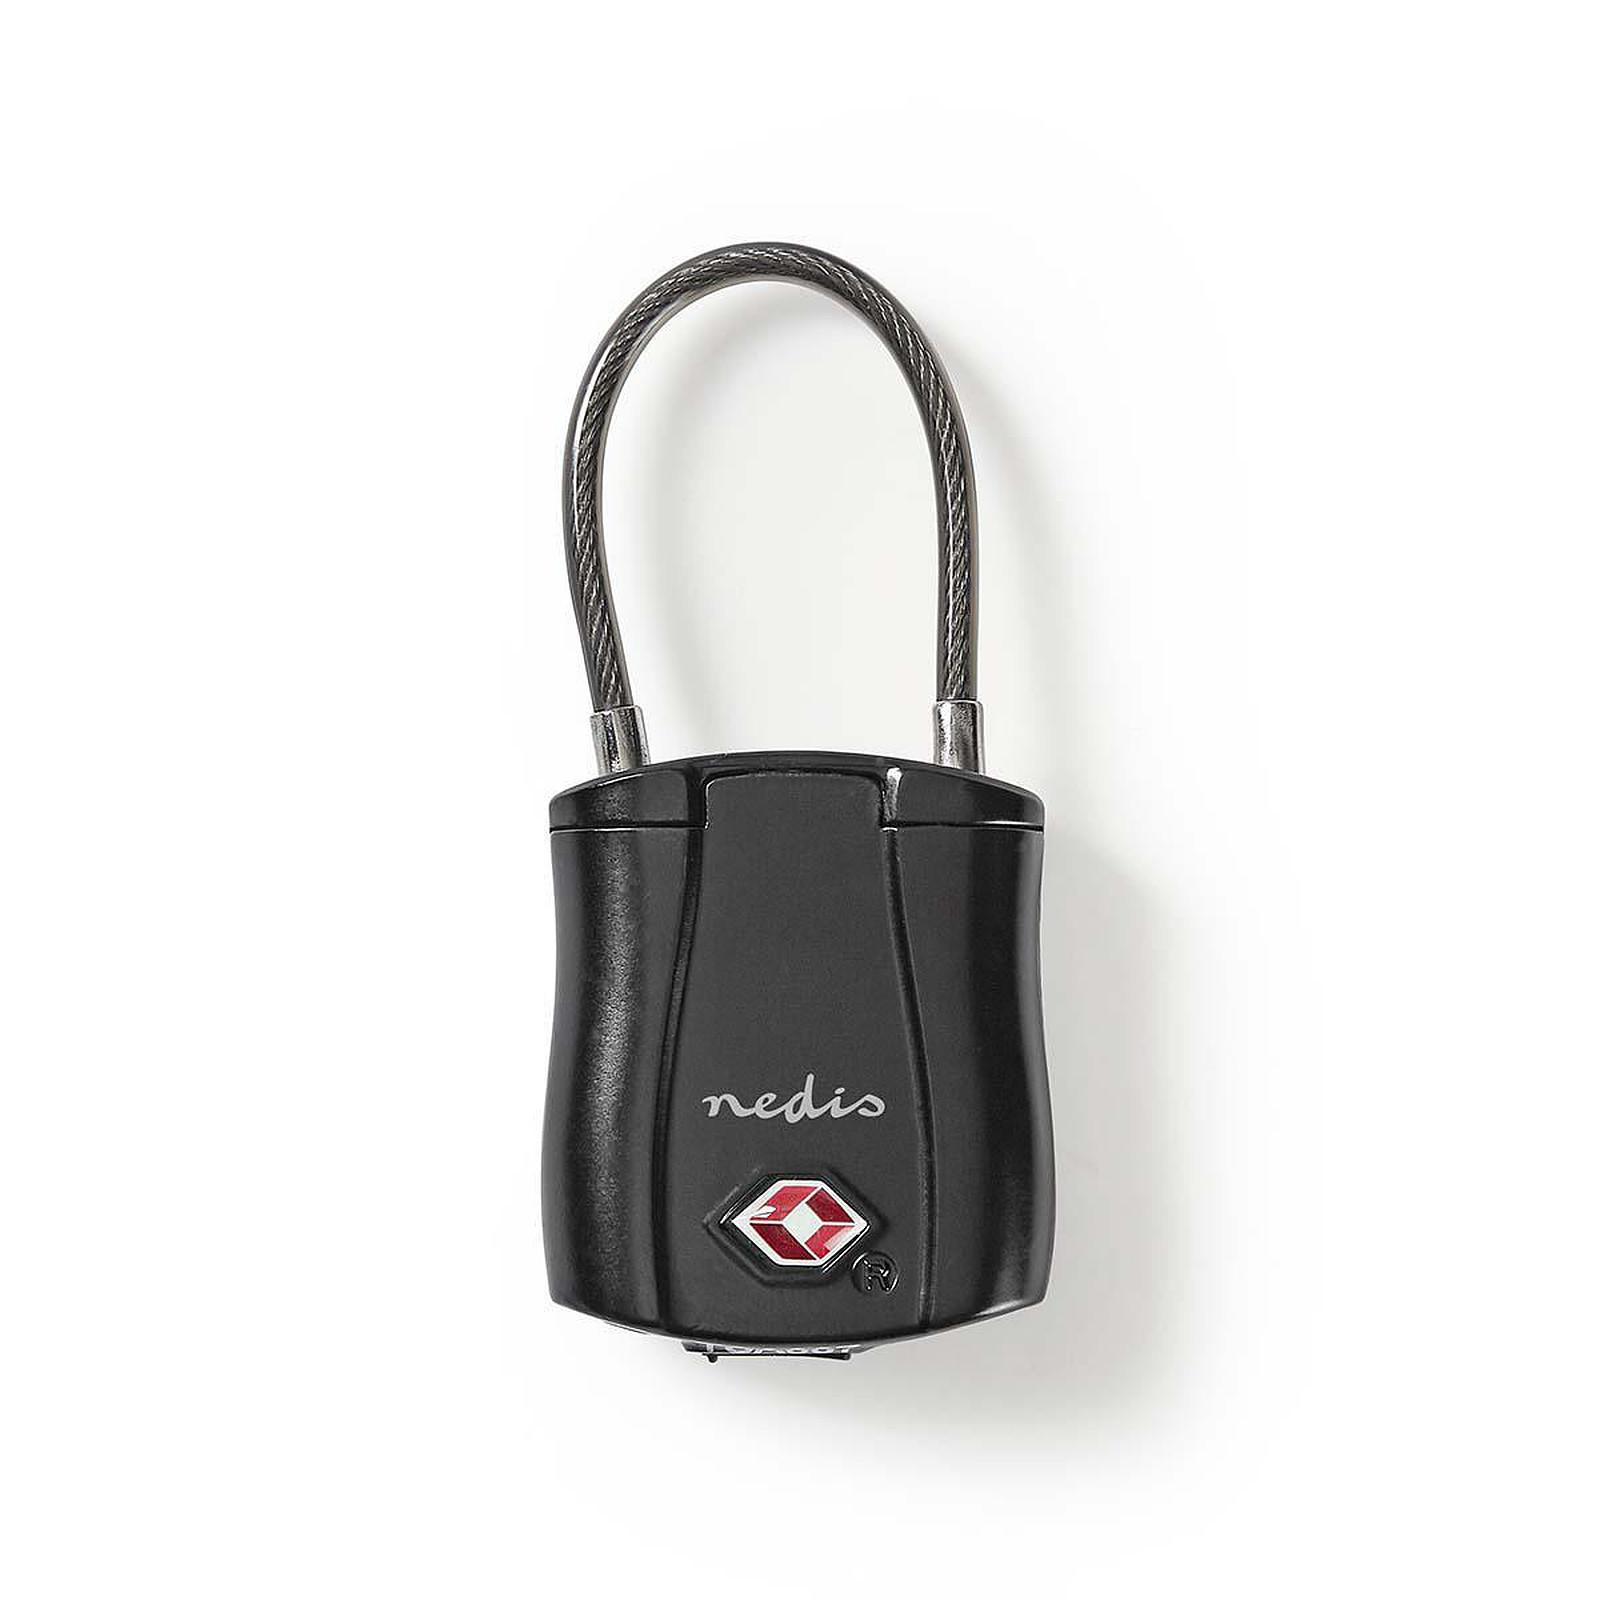 Nedis Bluetooth Luggage Lock